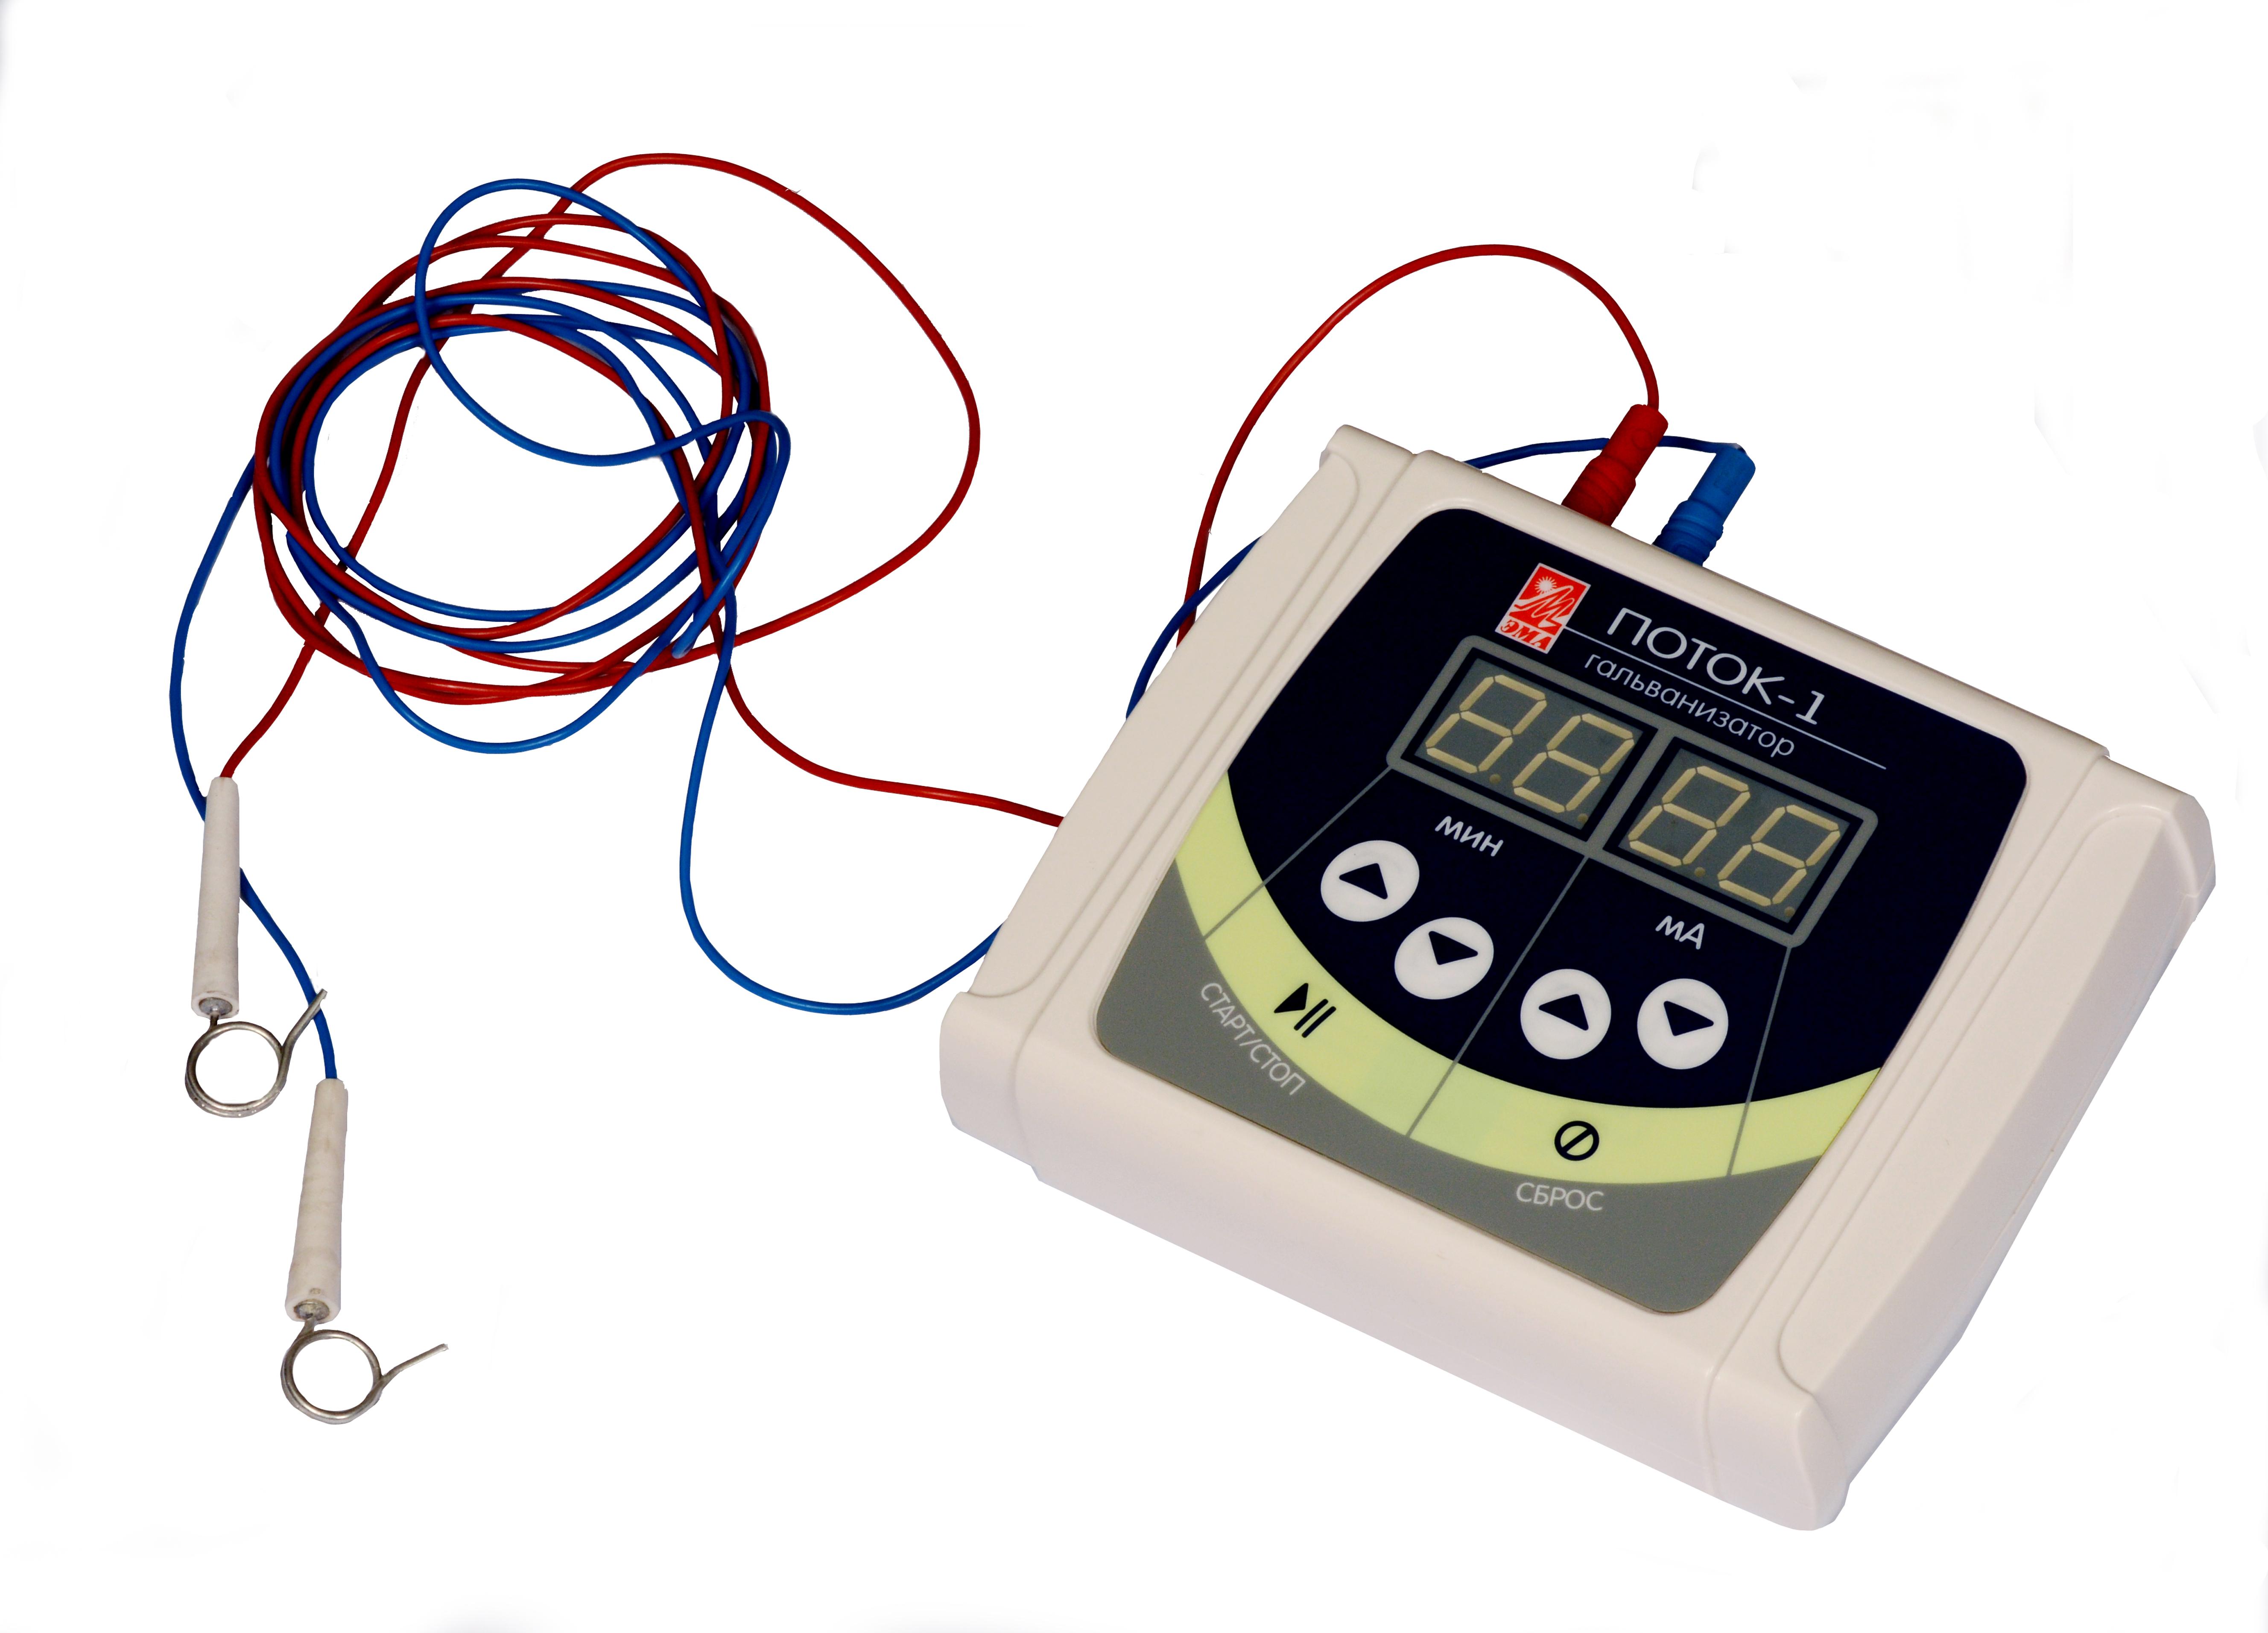 Аппарат для физиотерапии поток 1